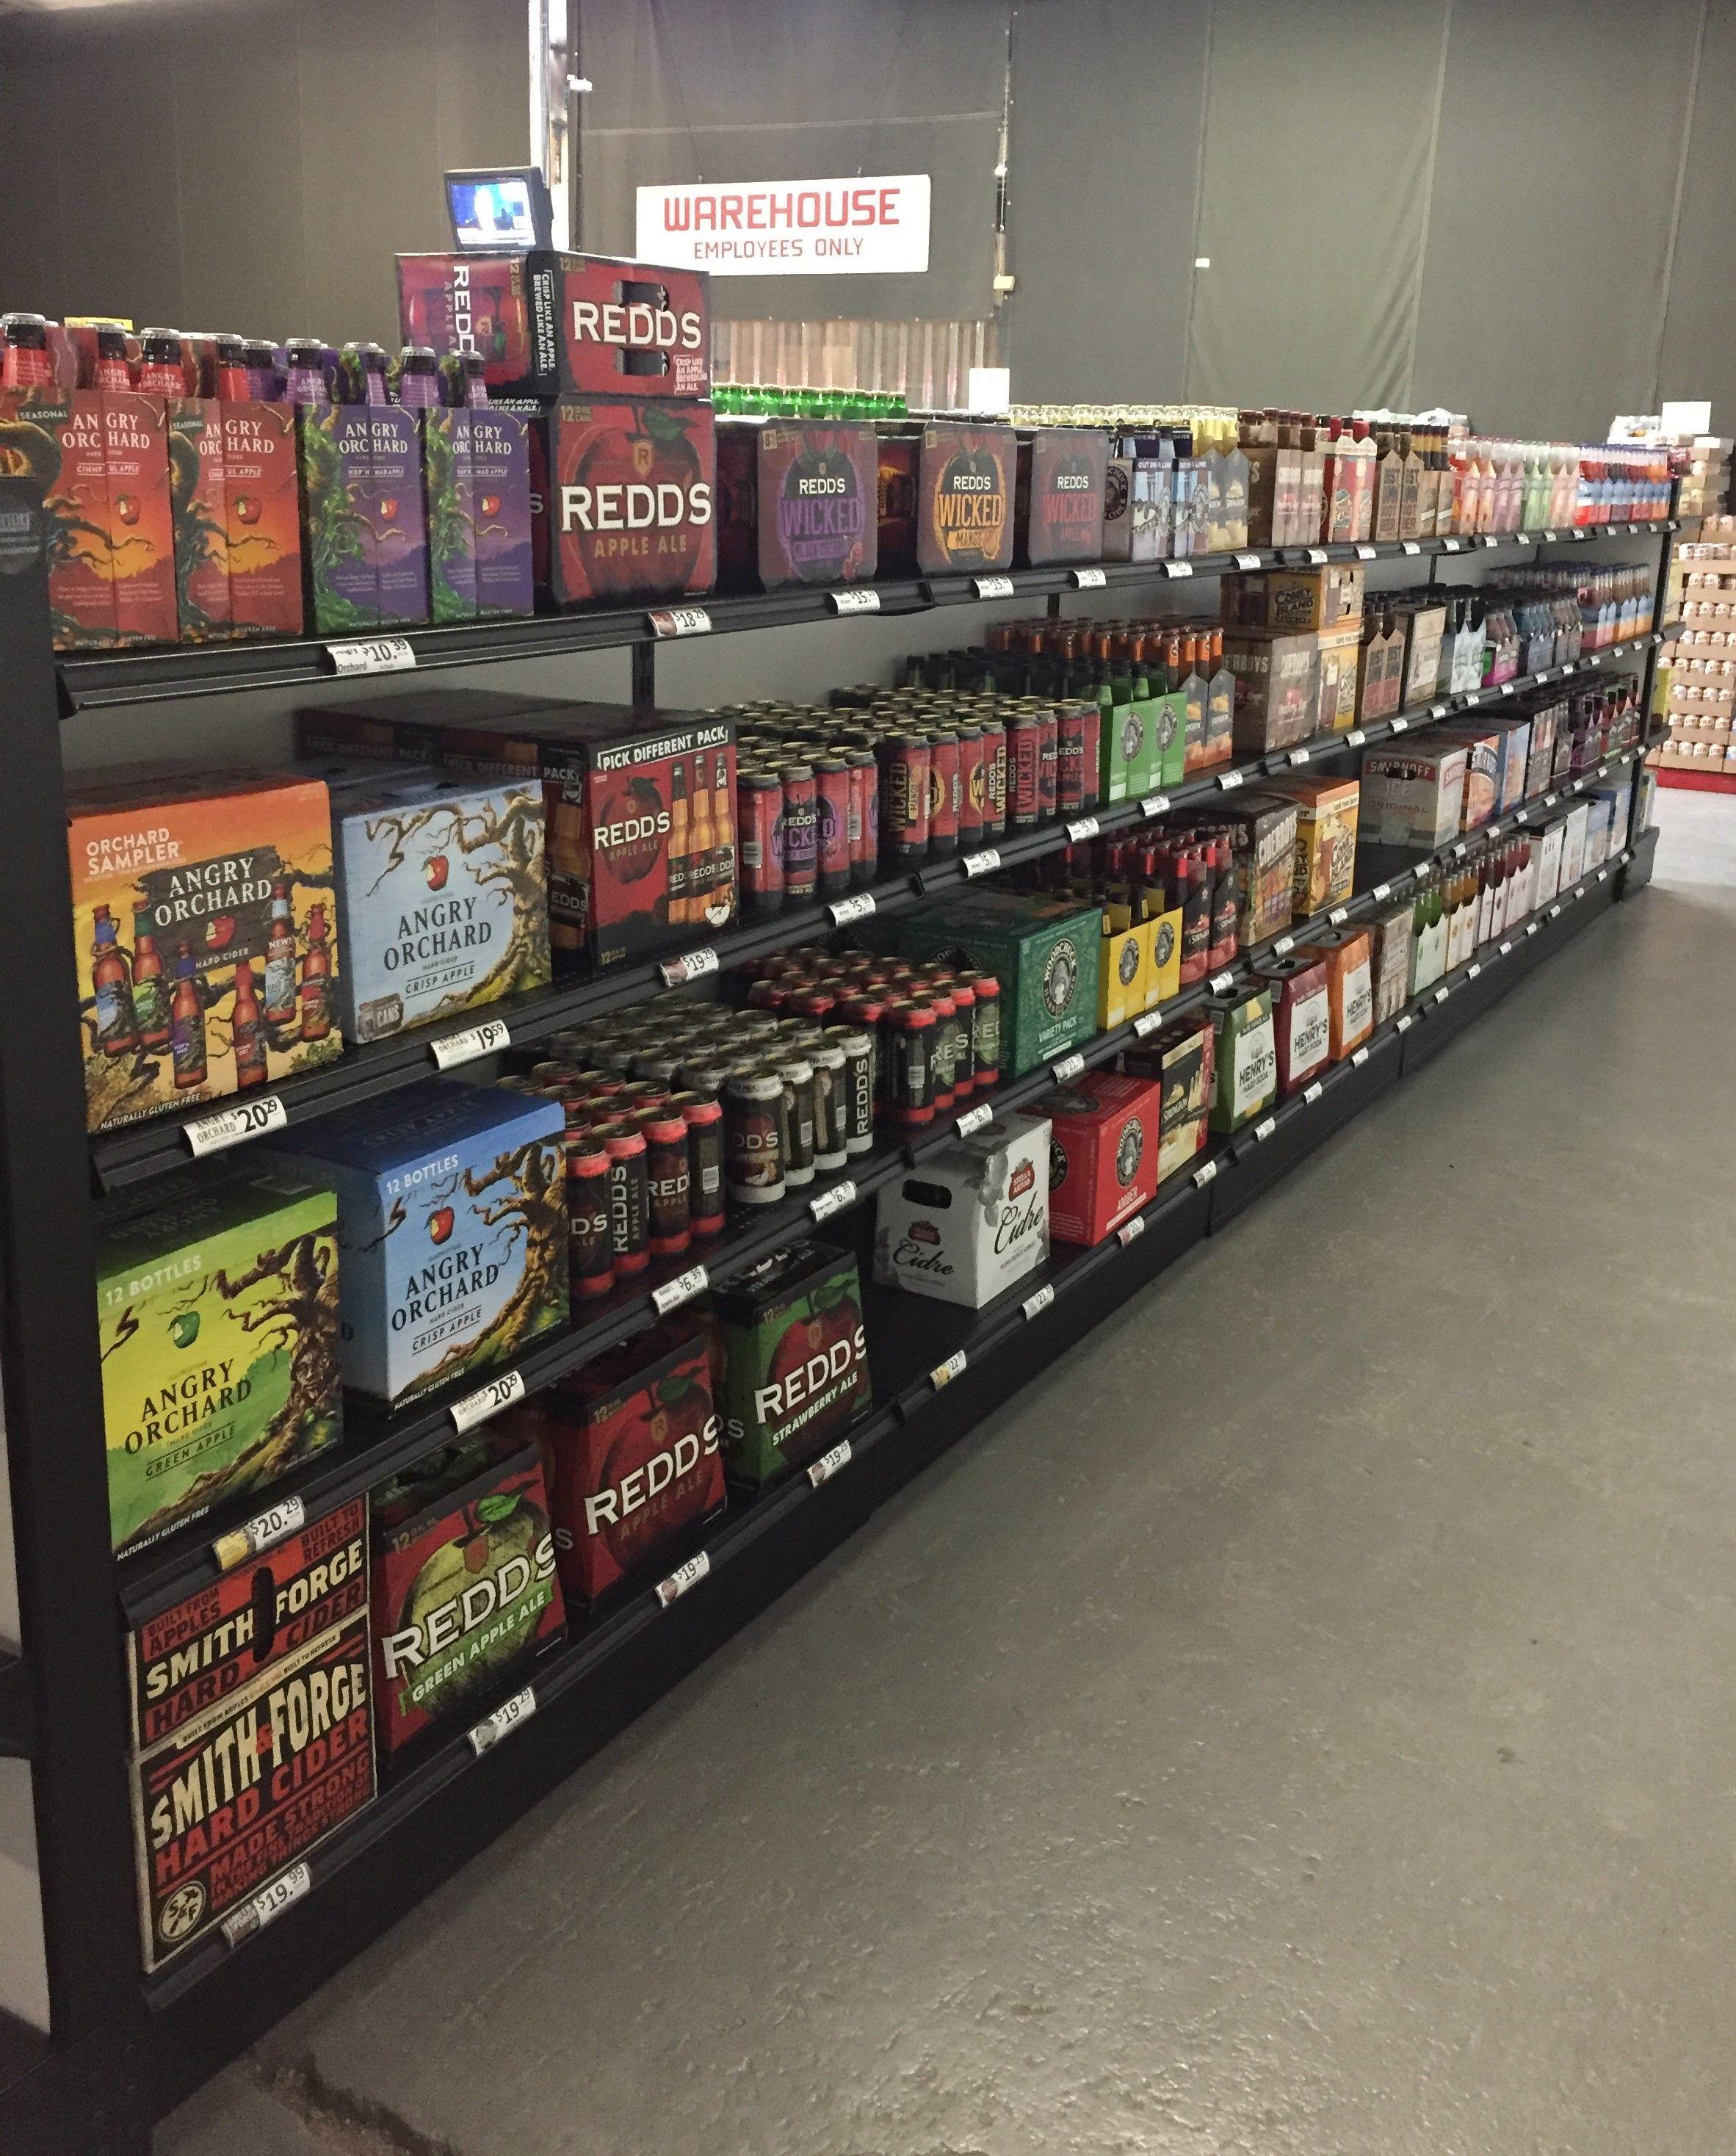 Handy Store Fixtures Liquor Store Gondola Shelving Fixtures Liquor Store Grocery Store Design Store Design